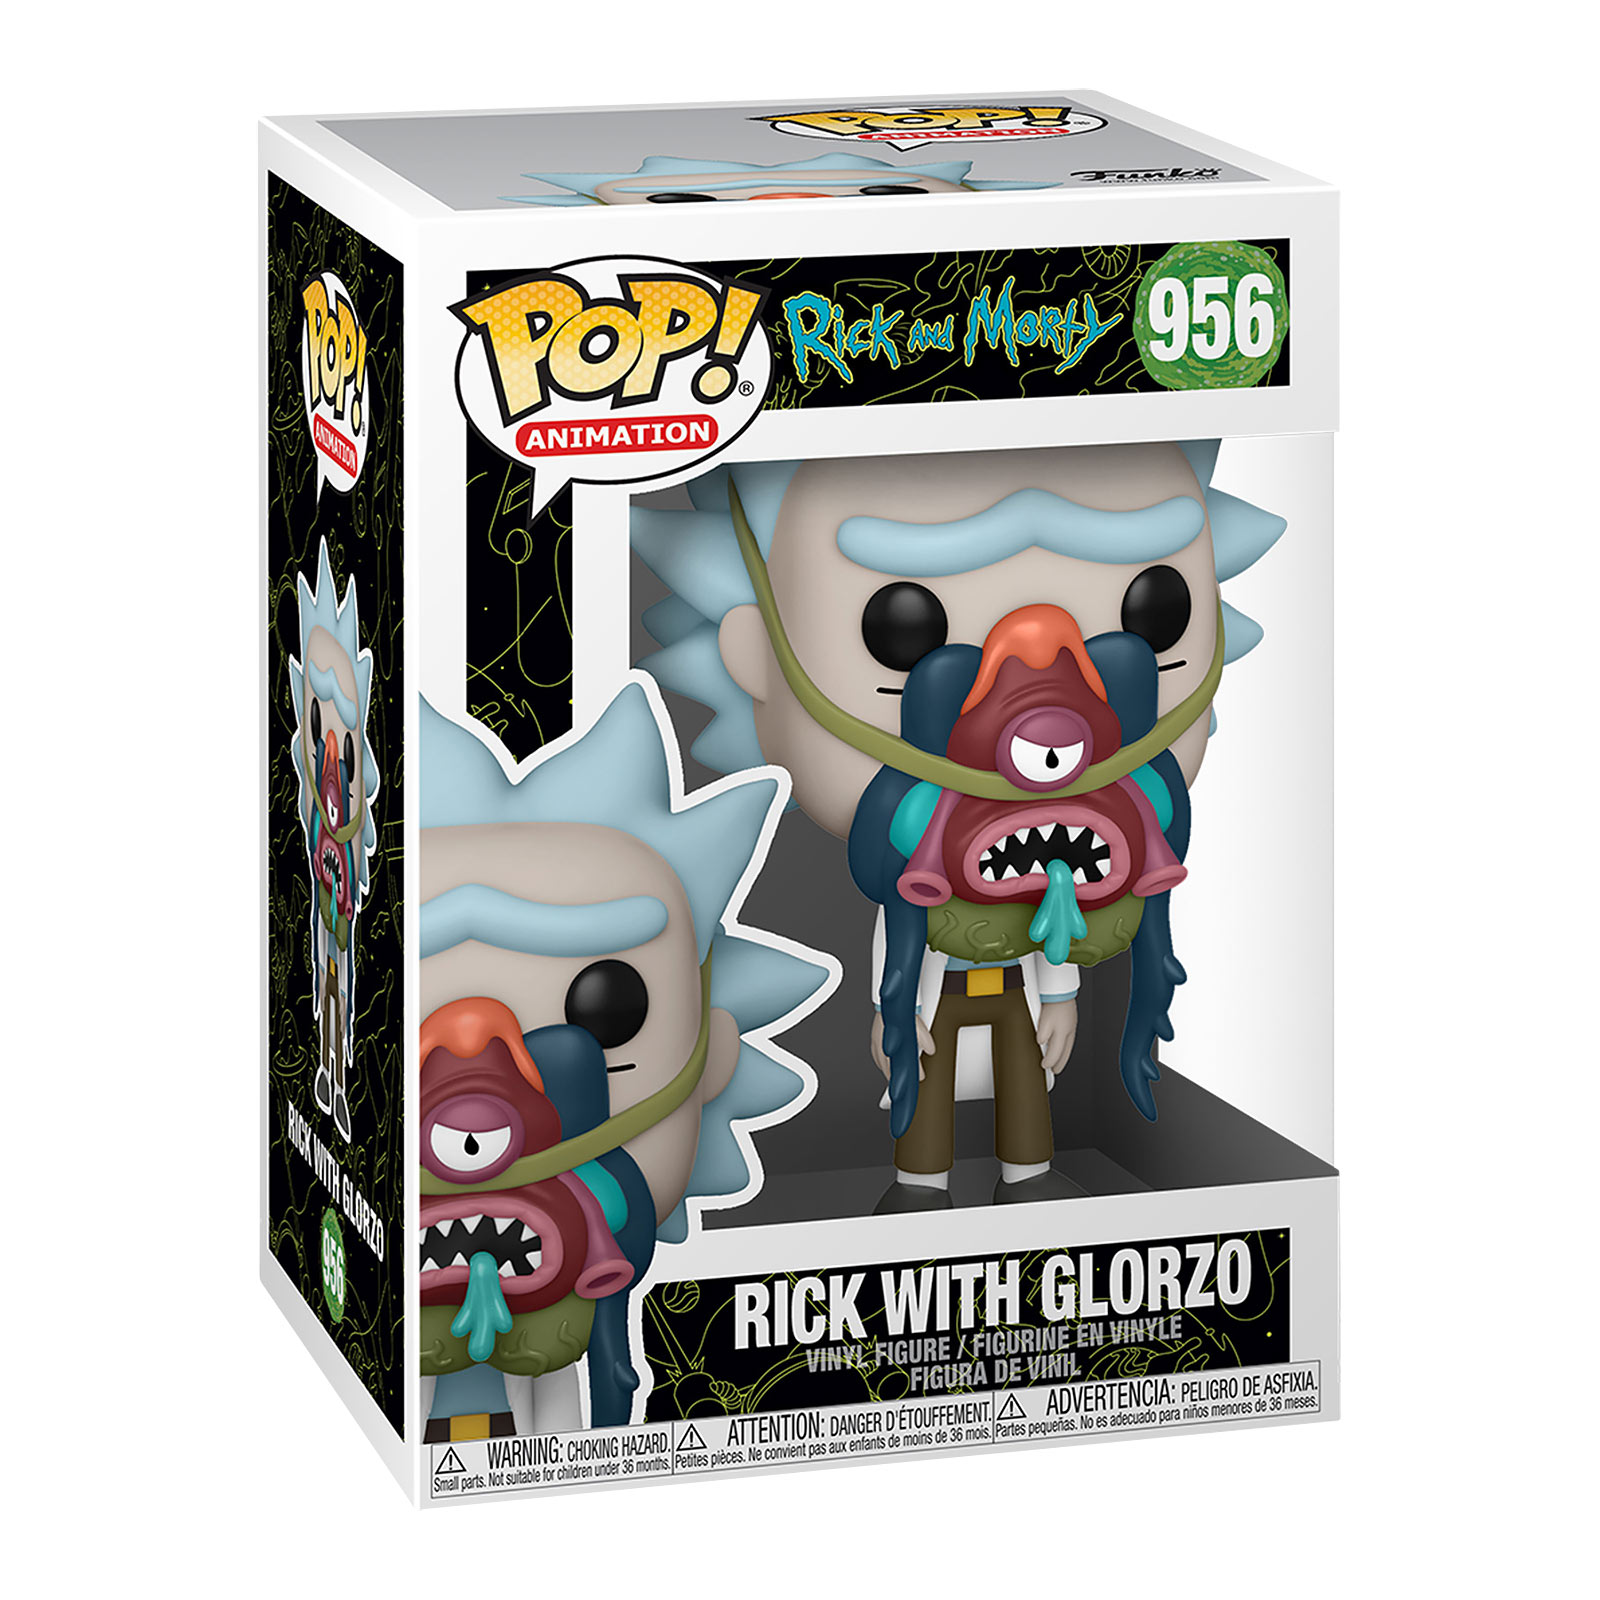 Rick and Morty - Rick mit Glorzo Funko Pop Figur